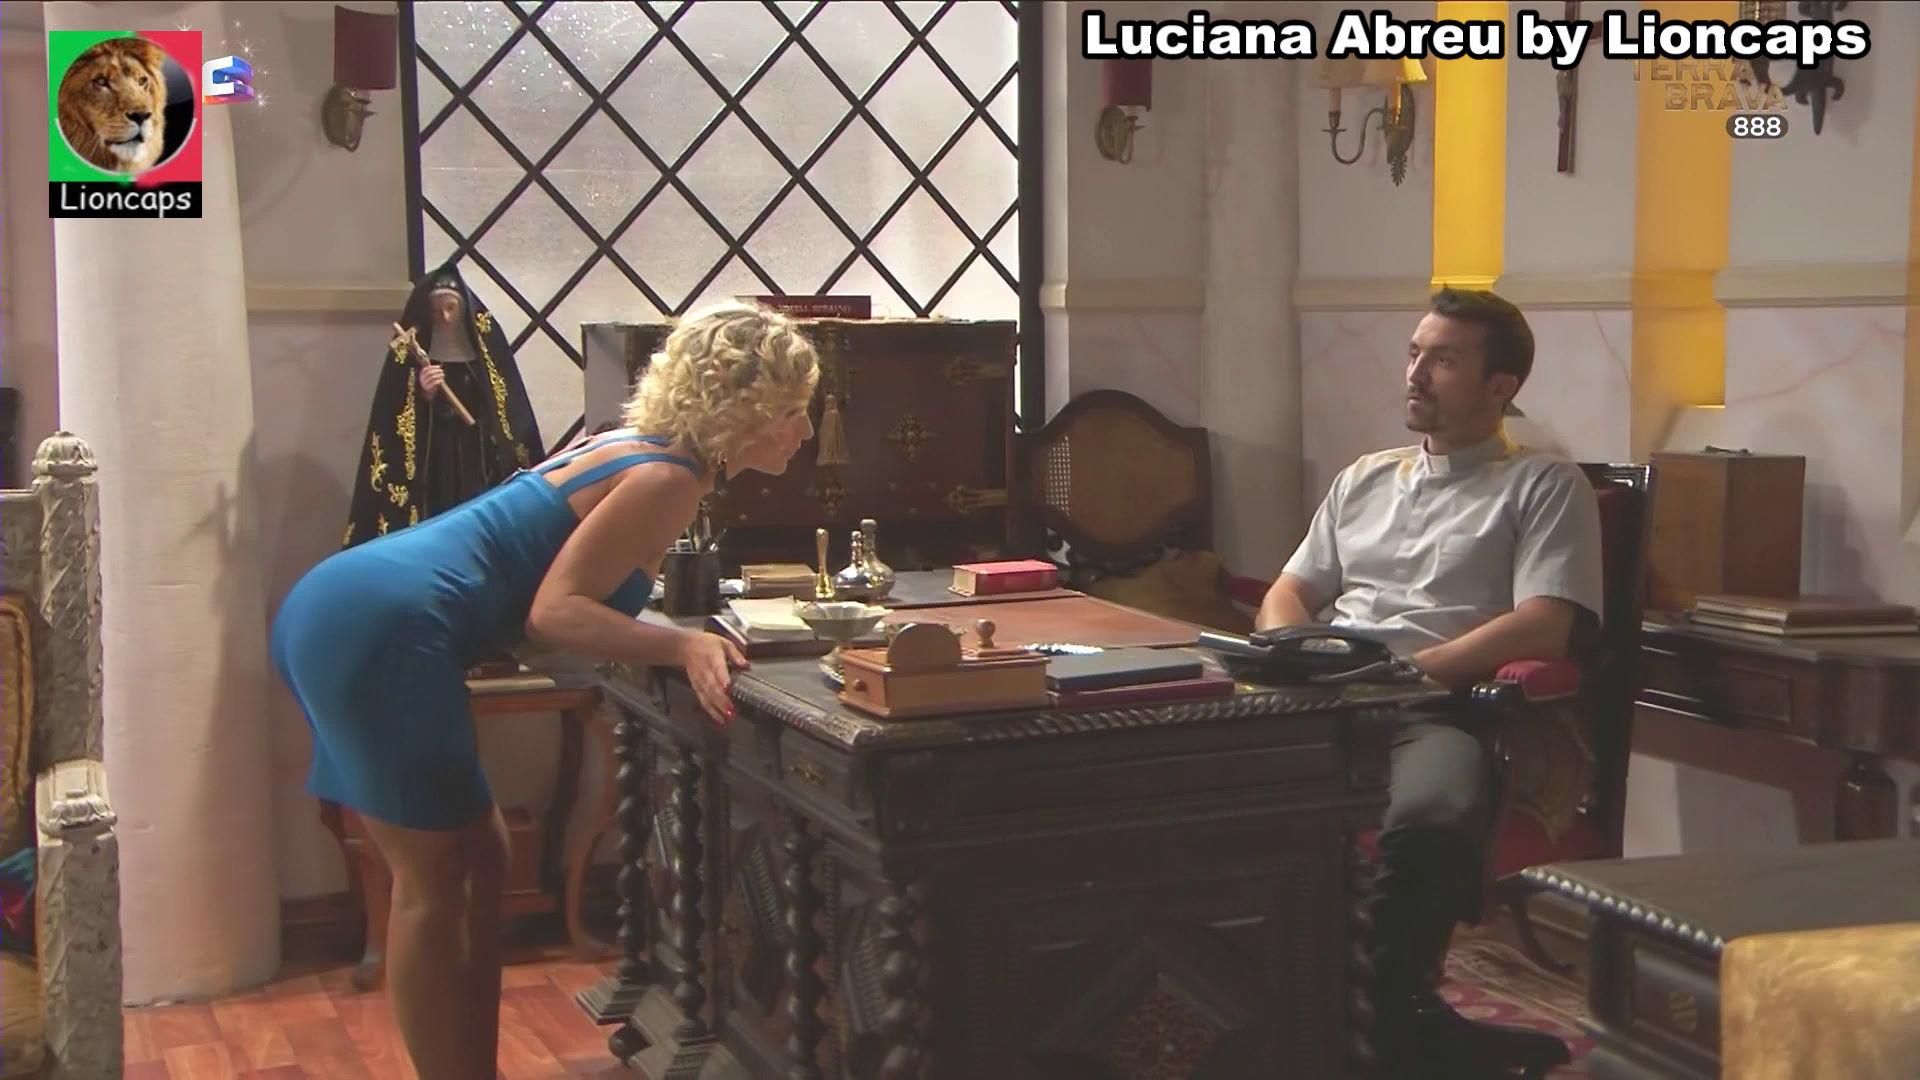 017077484_luciana_abreu_vs191222_02421_122_237lo.JPG